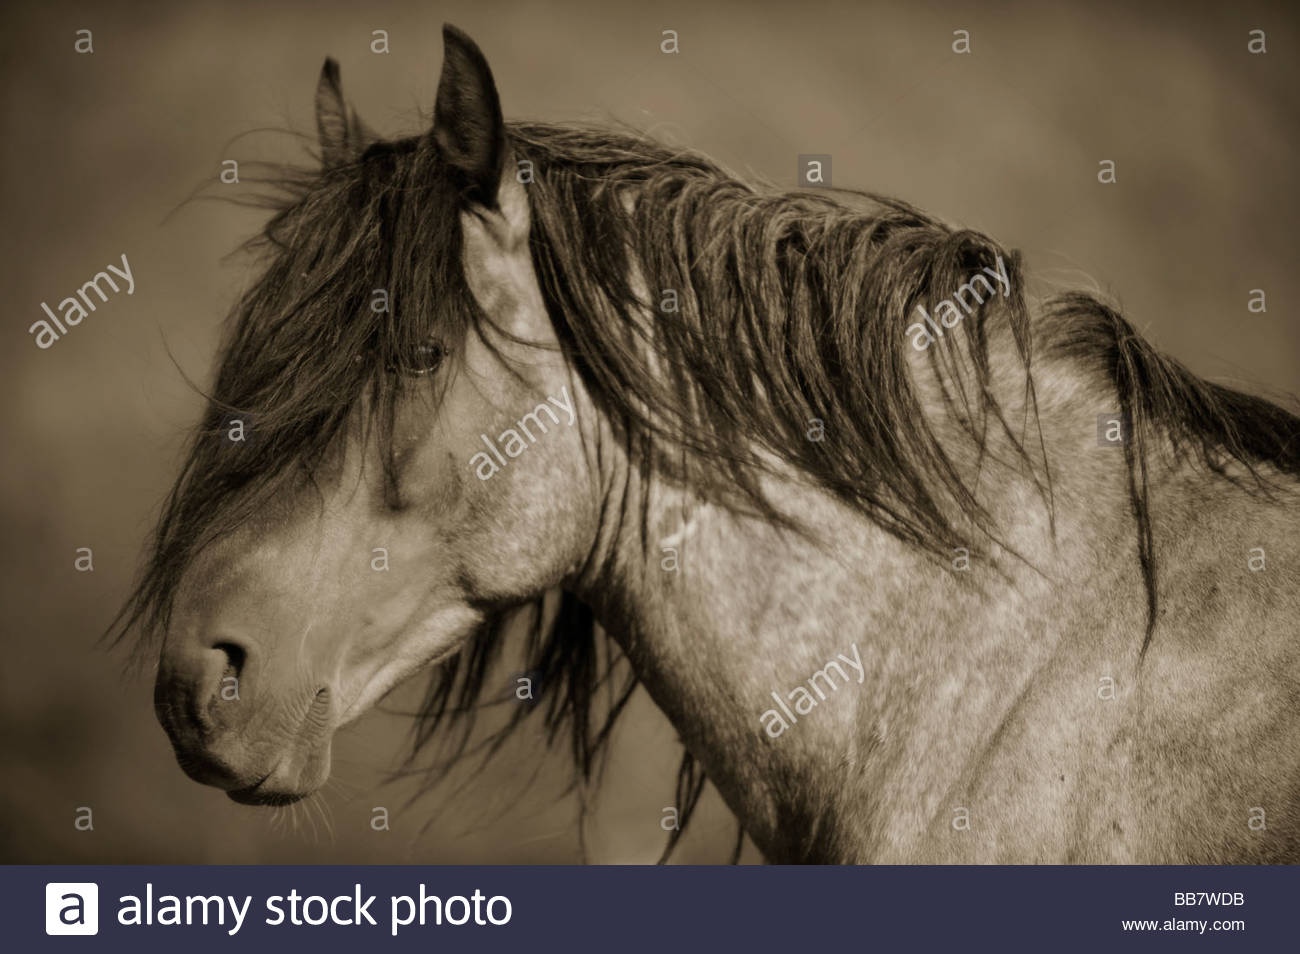 Wild Mustang Stallion with Windblown Mane - Stock Image